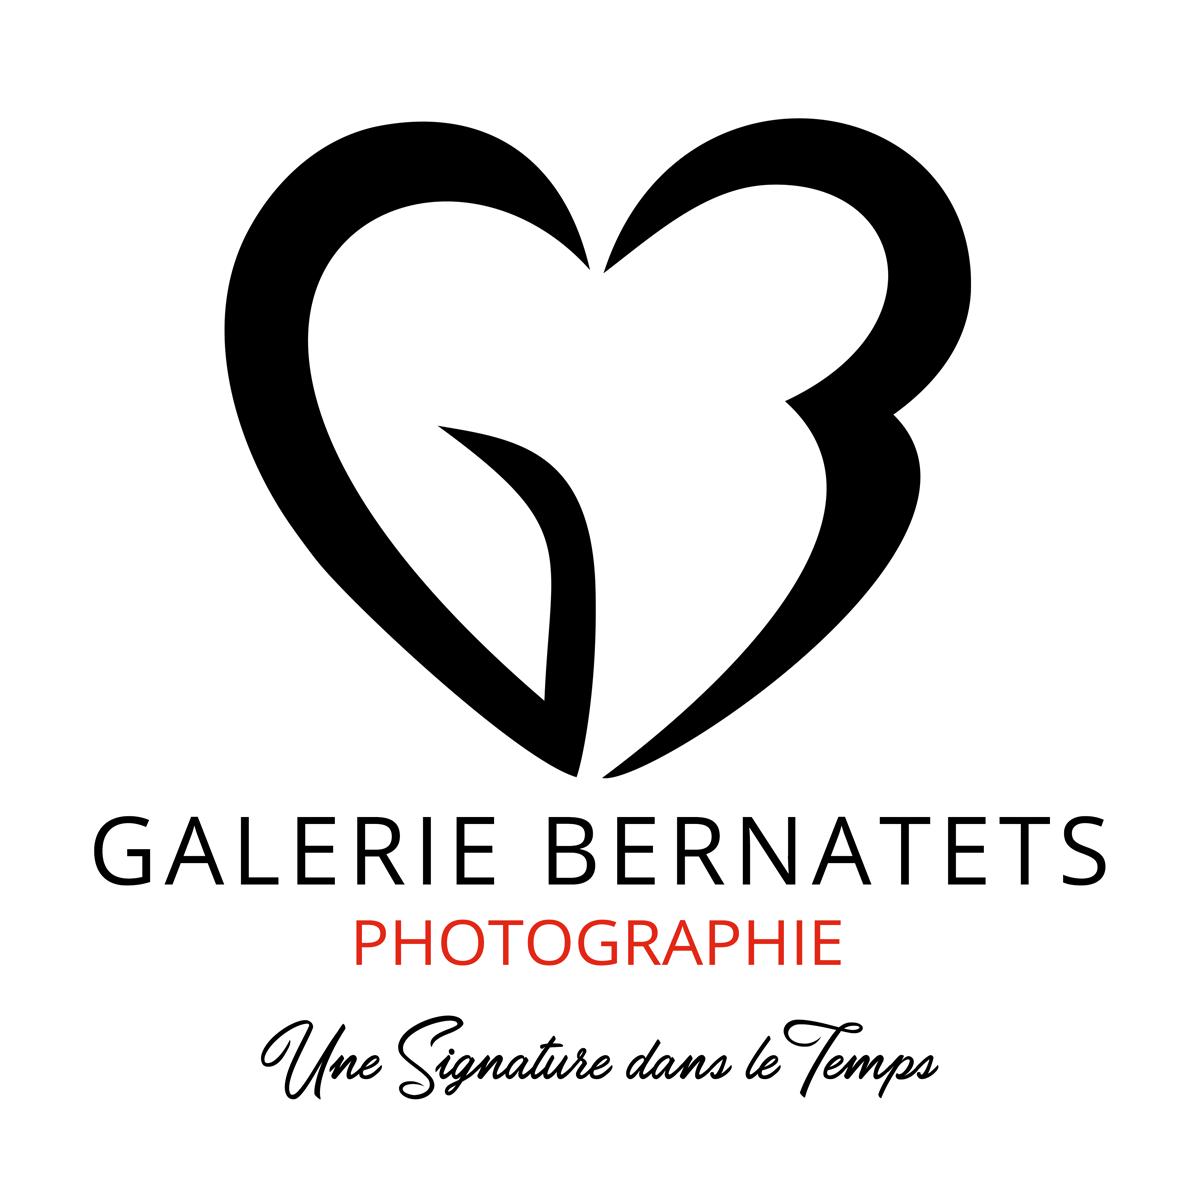 Galerie Bernatets